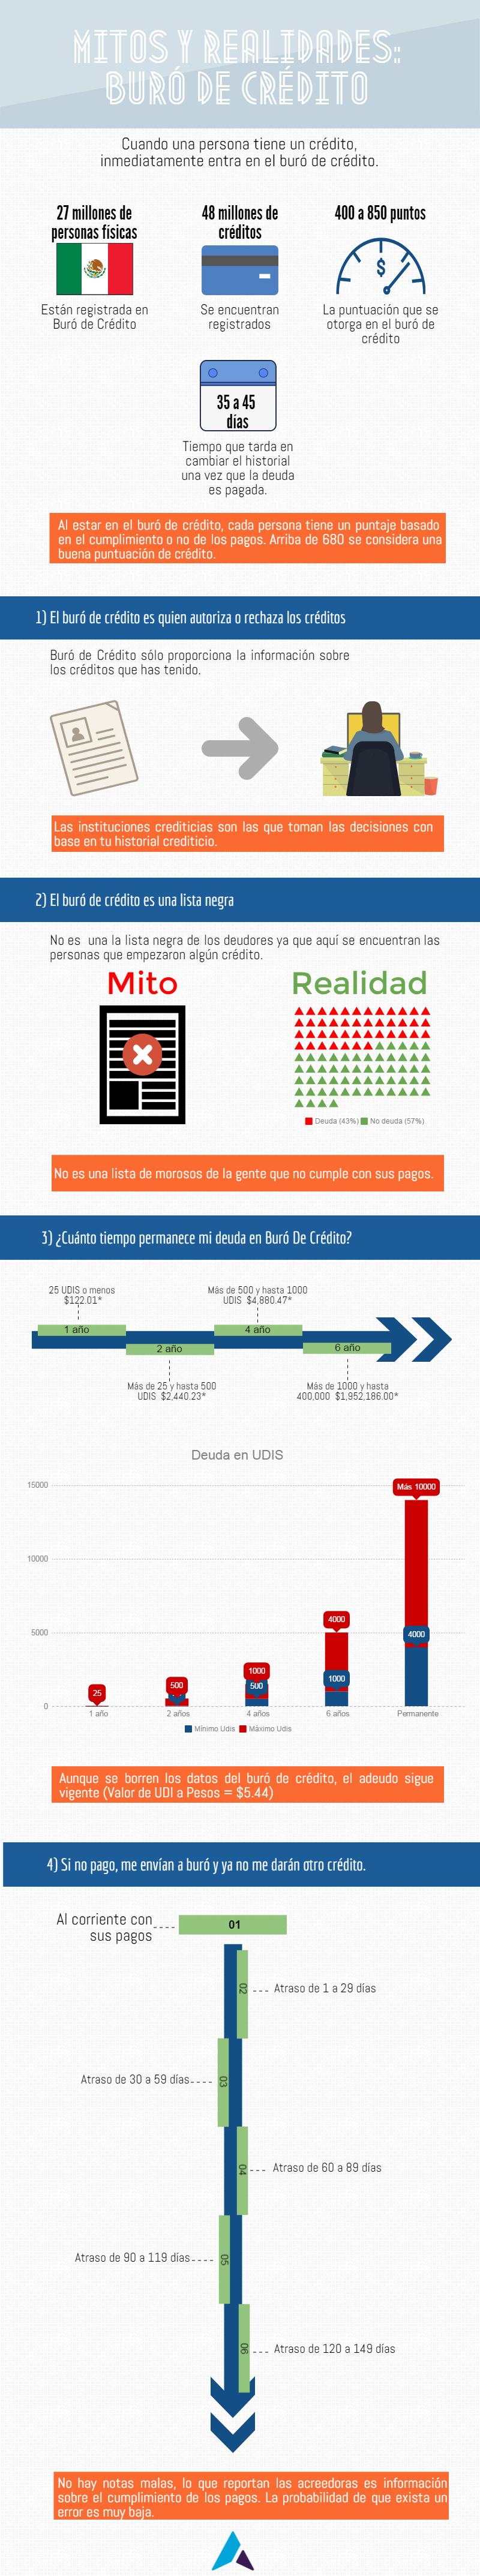 Mitos Y Realidades Sobre Buro De Credito Infografia Aspiria Newsroom